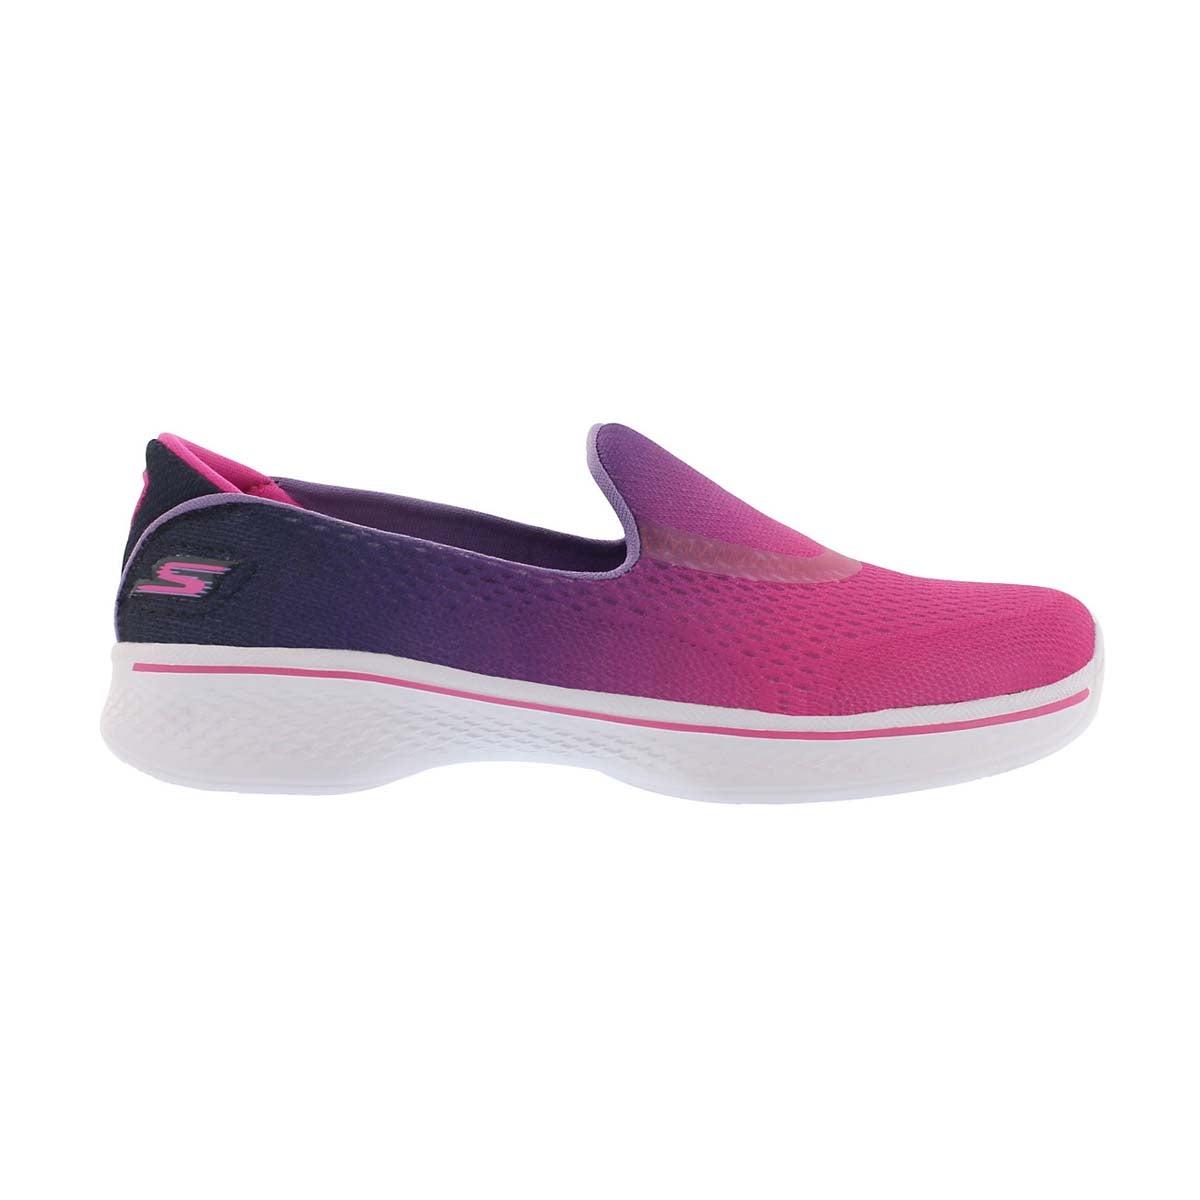 Grls GO Walk 4 pink ombre slip on shoe